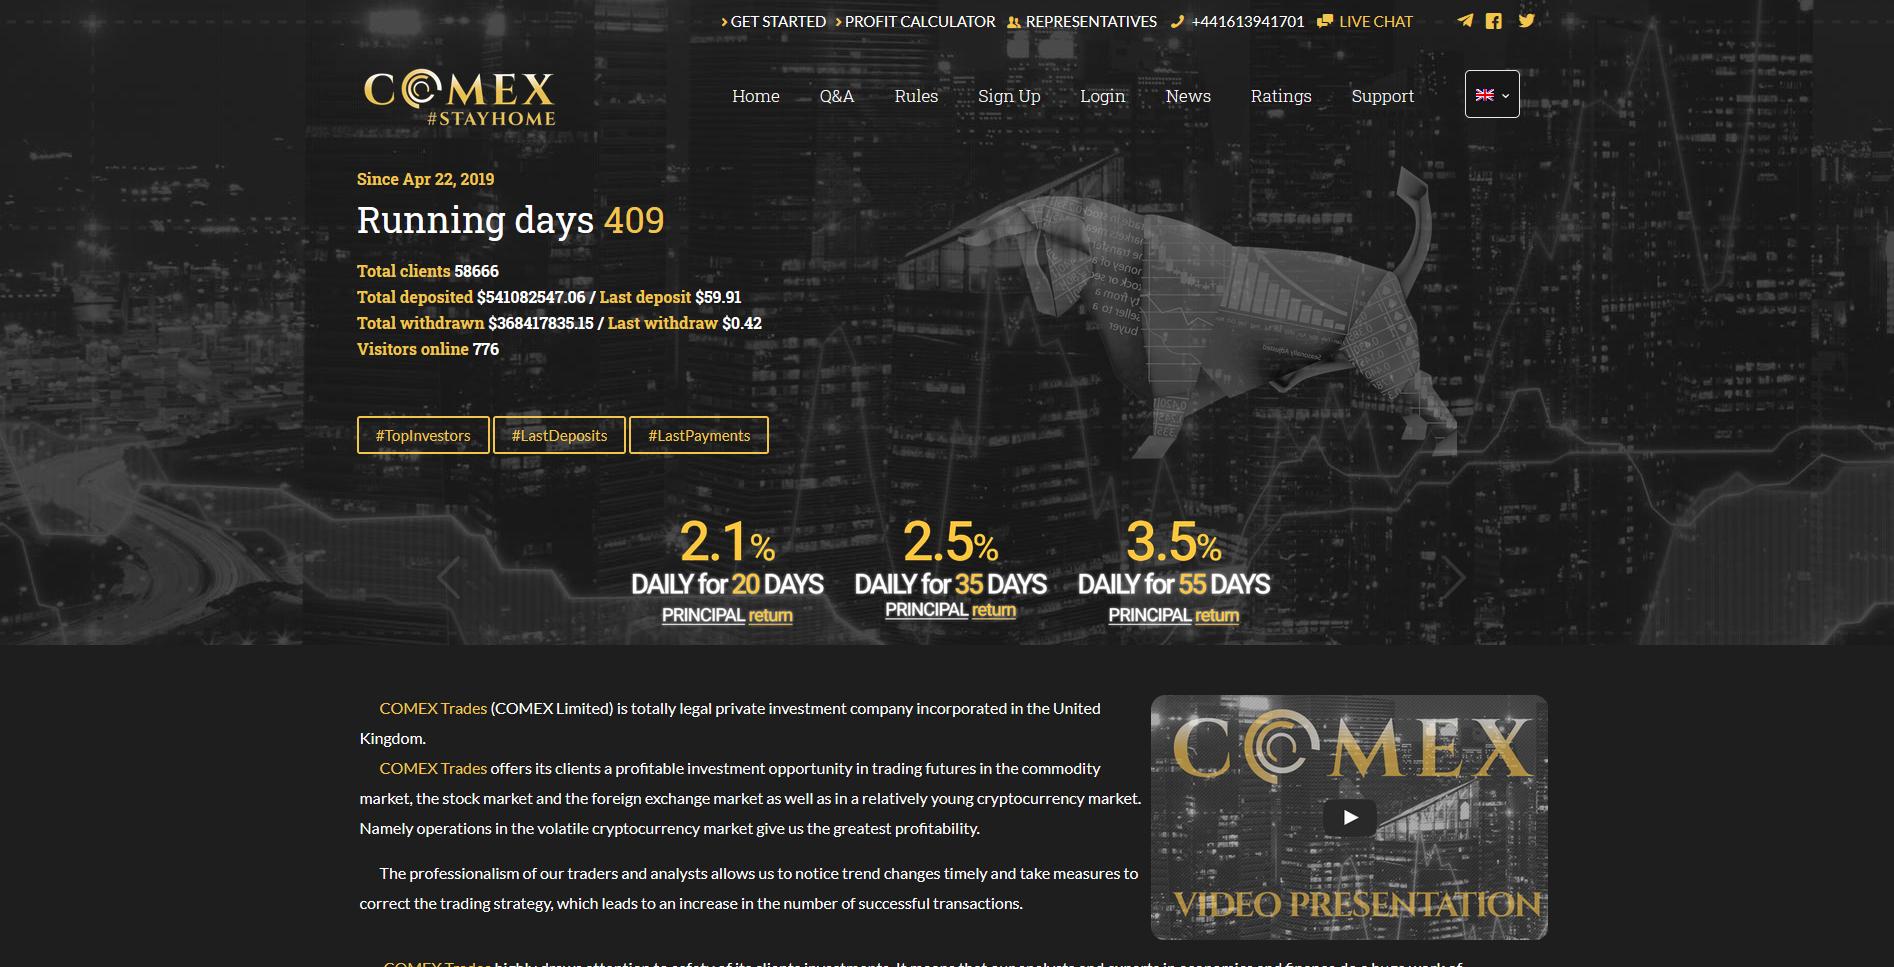 COMEX Trades - comextrades.com